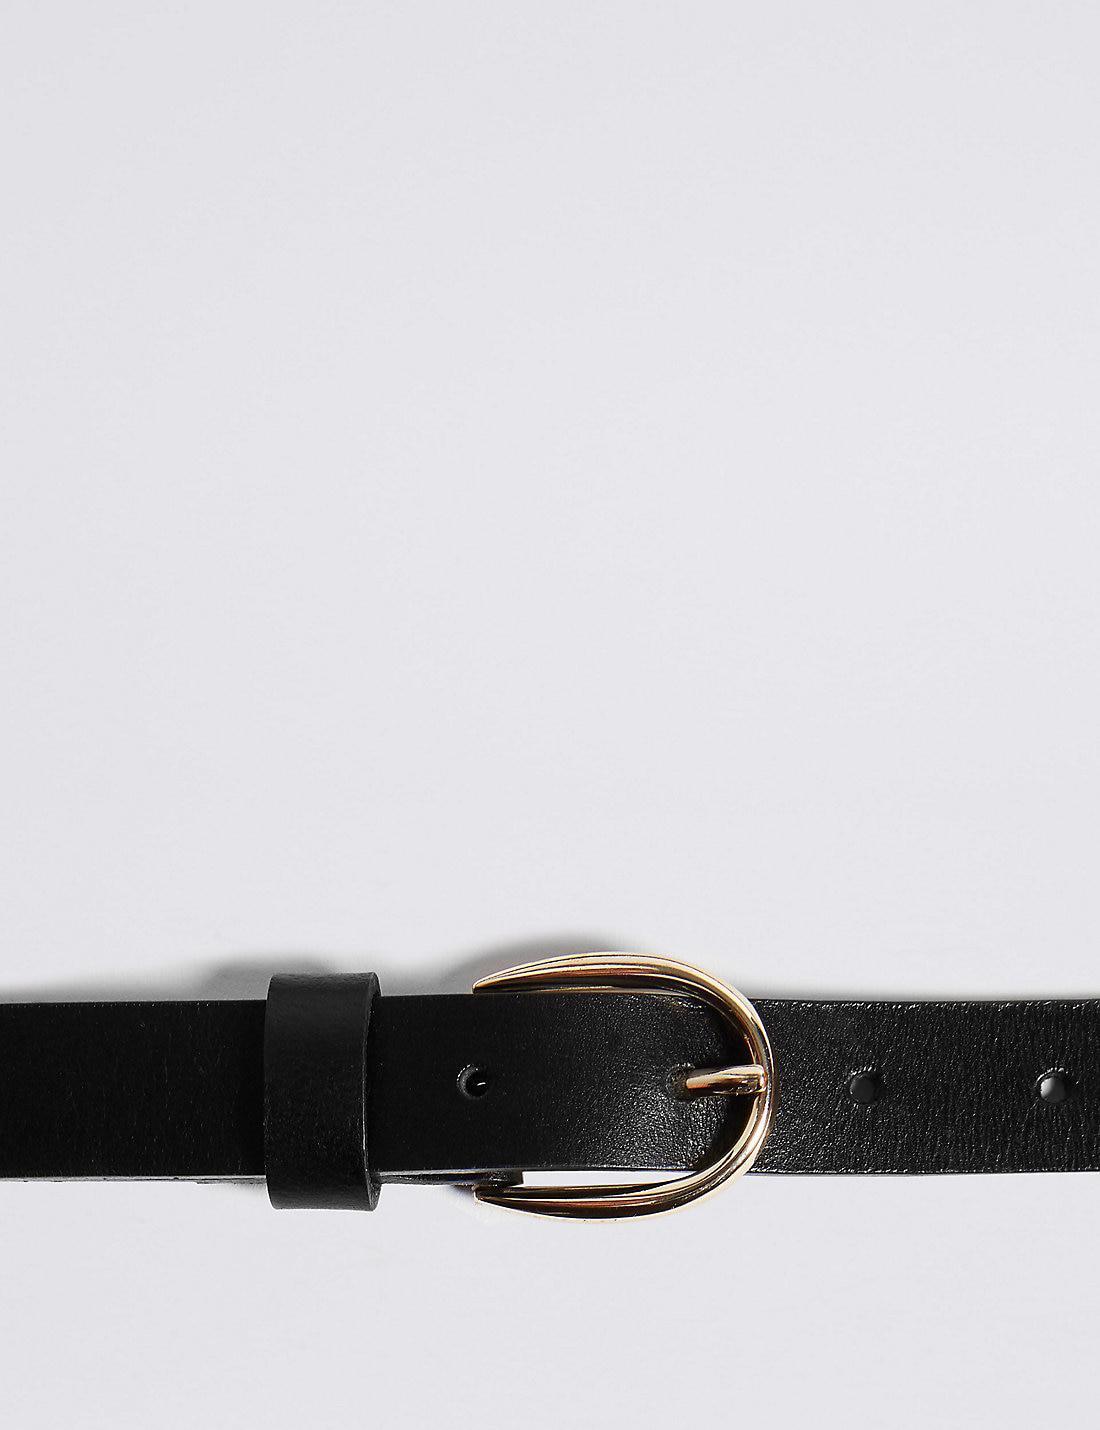 Small Leather Goods - Belts Tim Van Steenbergen g3fwa